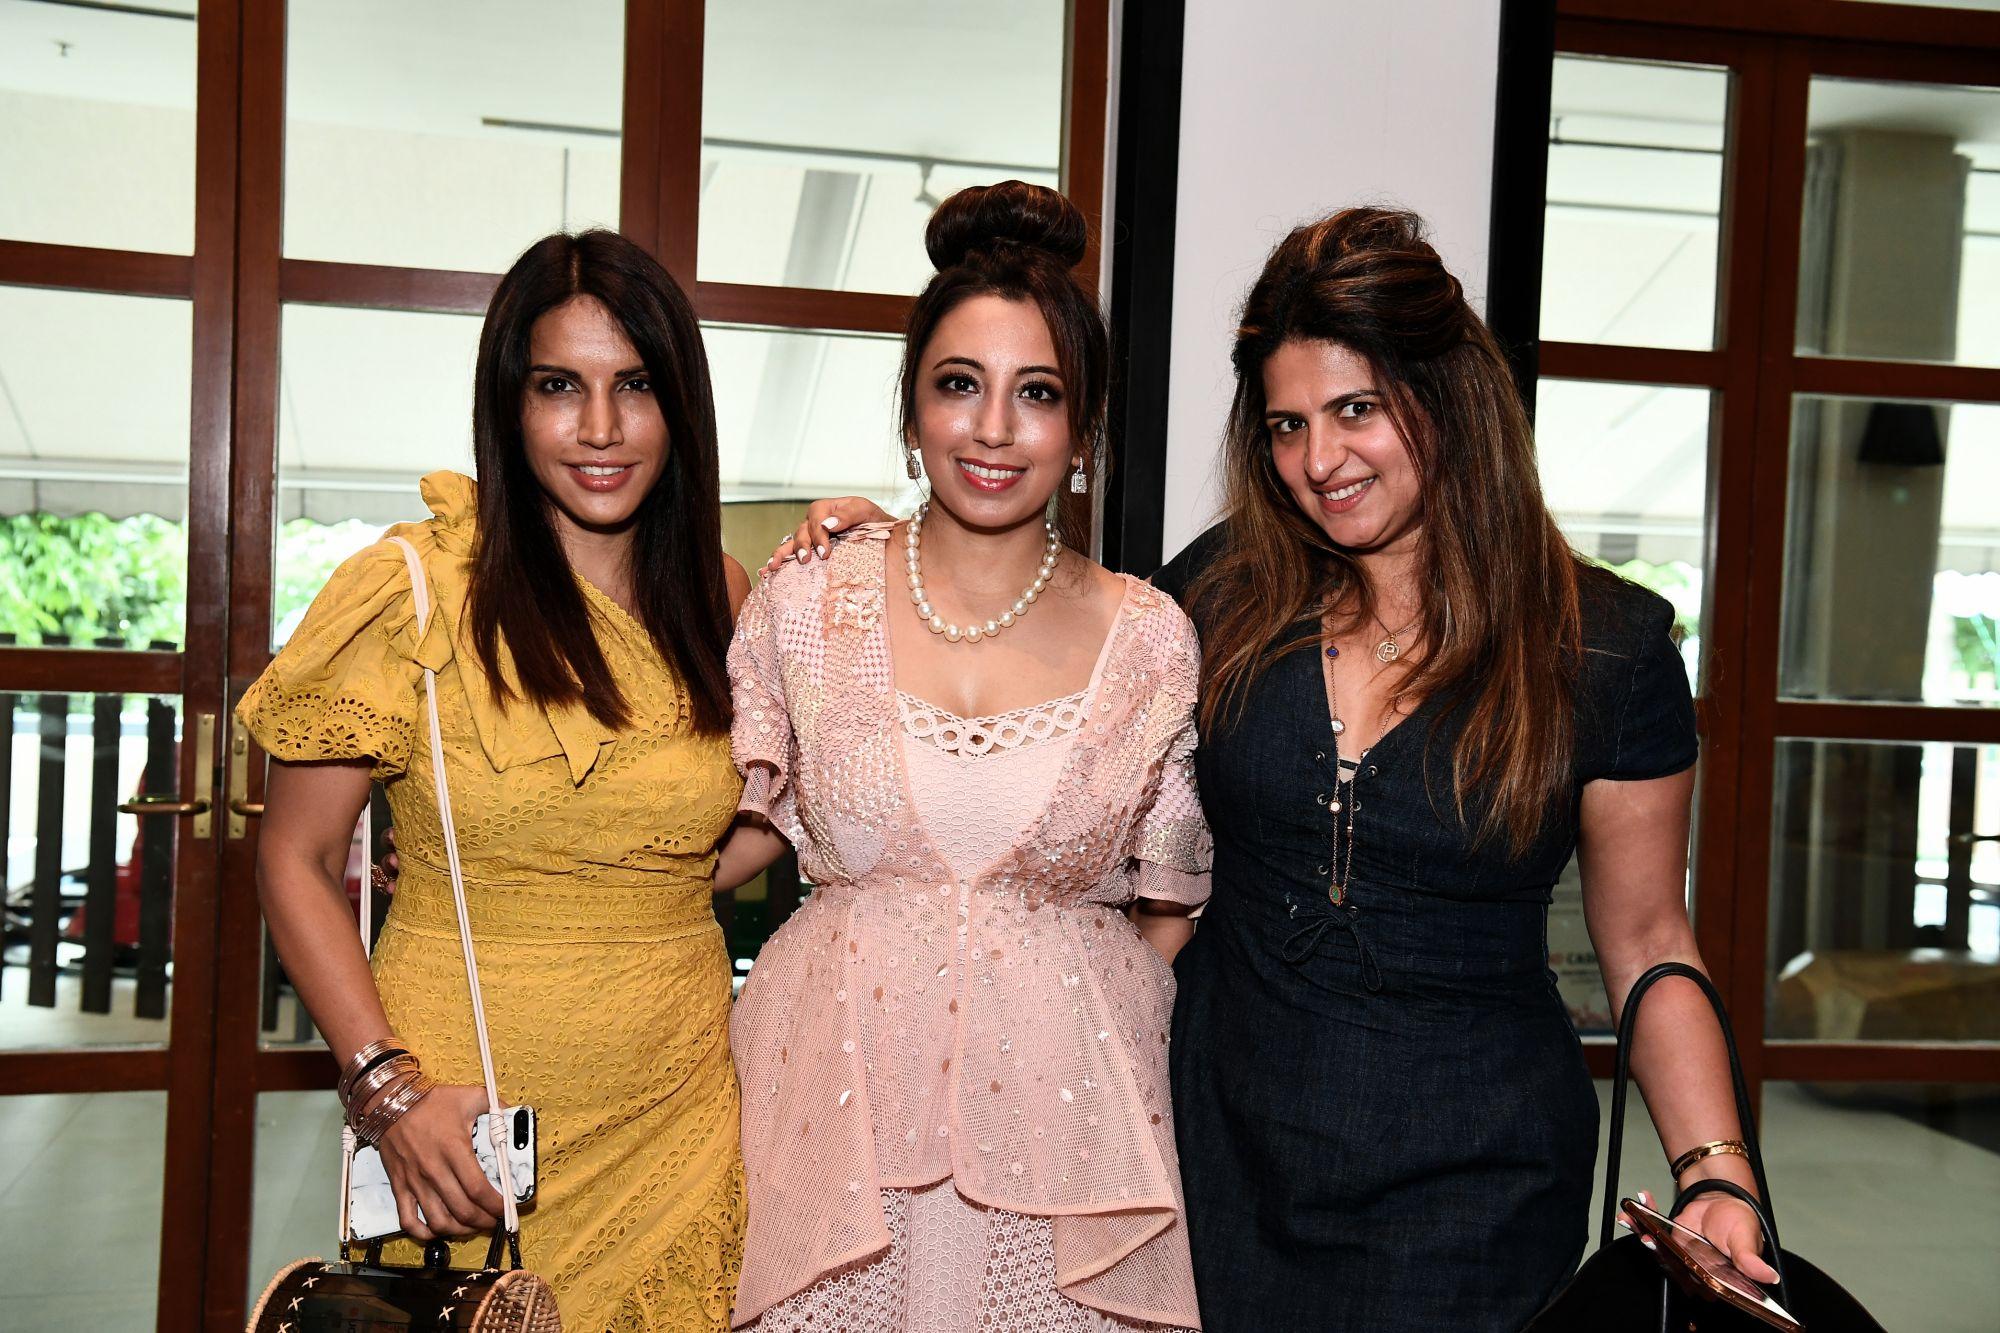 Resham Melwani, Dimple Aswani, Puja Kripalani